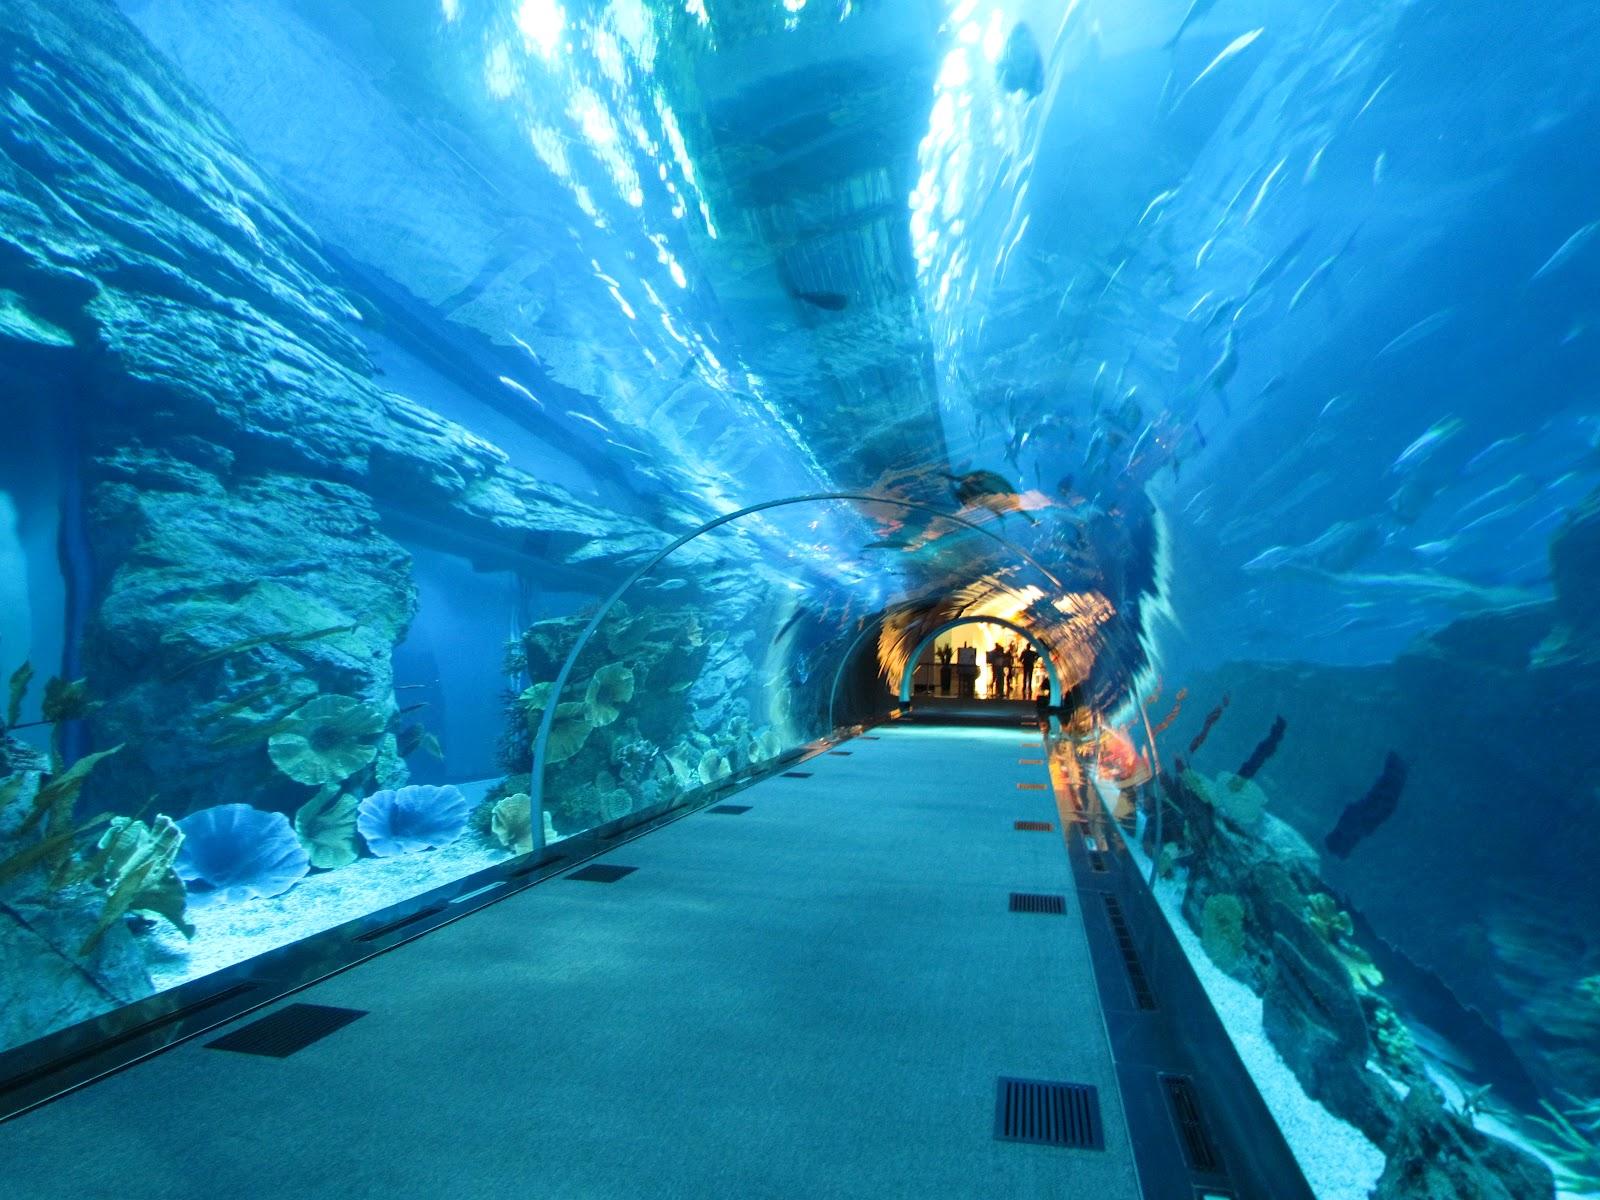 dubai aquarium - إكواريوم دبي (2)